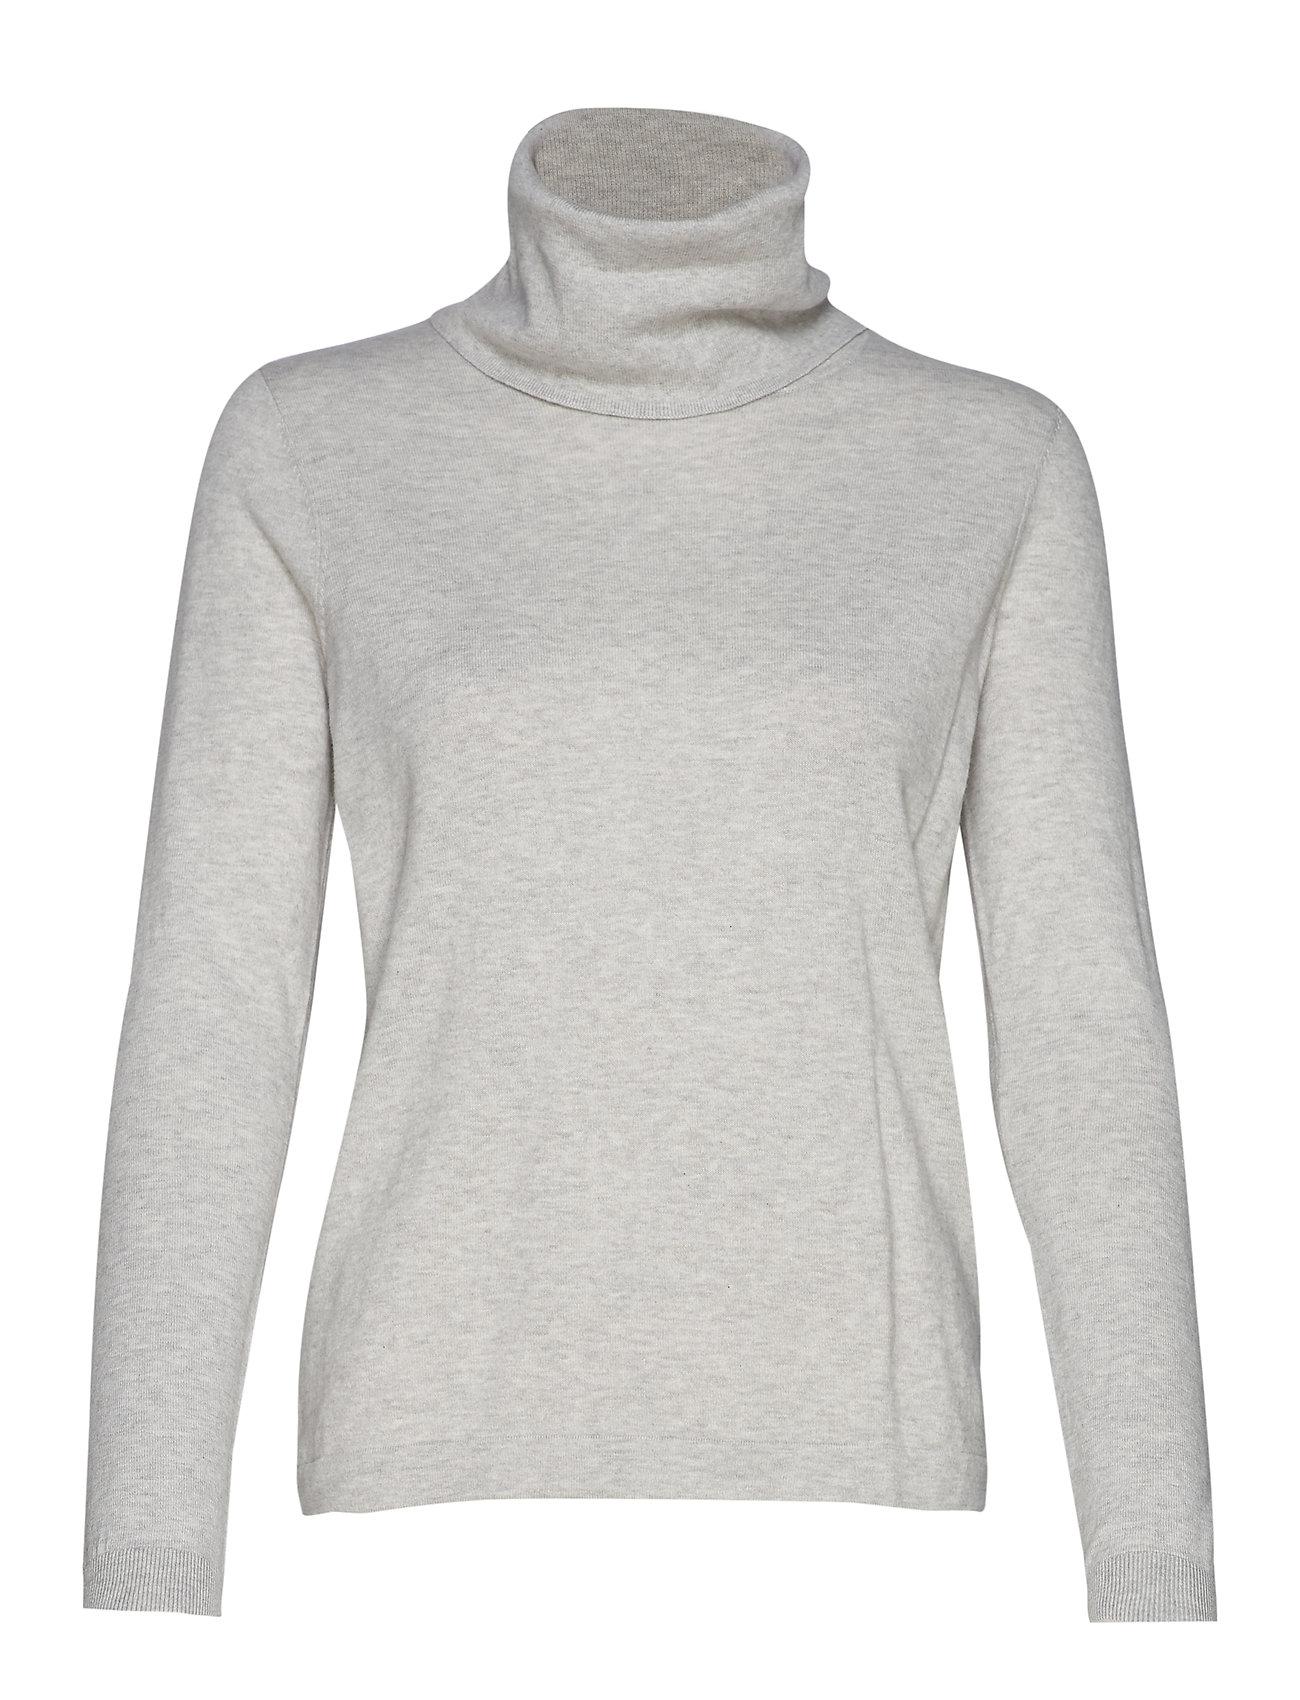 Lexington Clothing Francoise Roll Neck Sweater - LIGHT GREY MELANGE